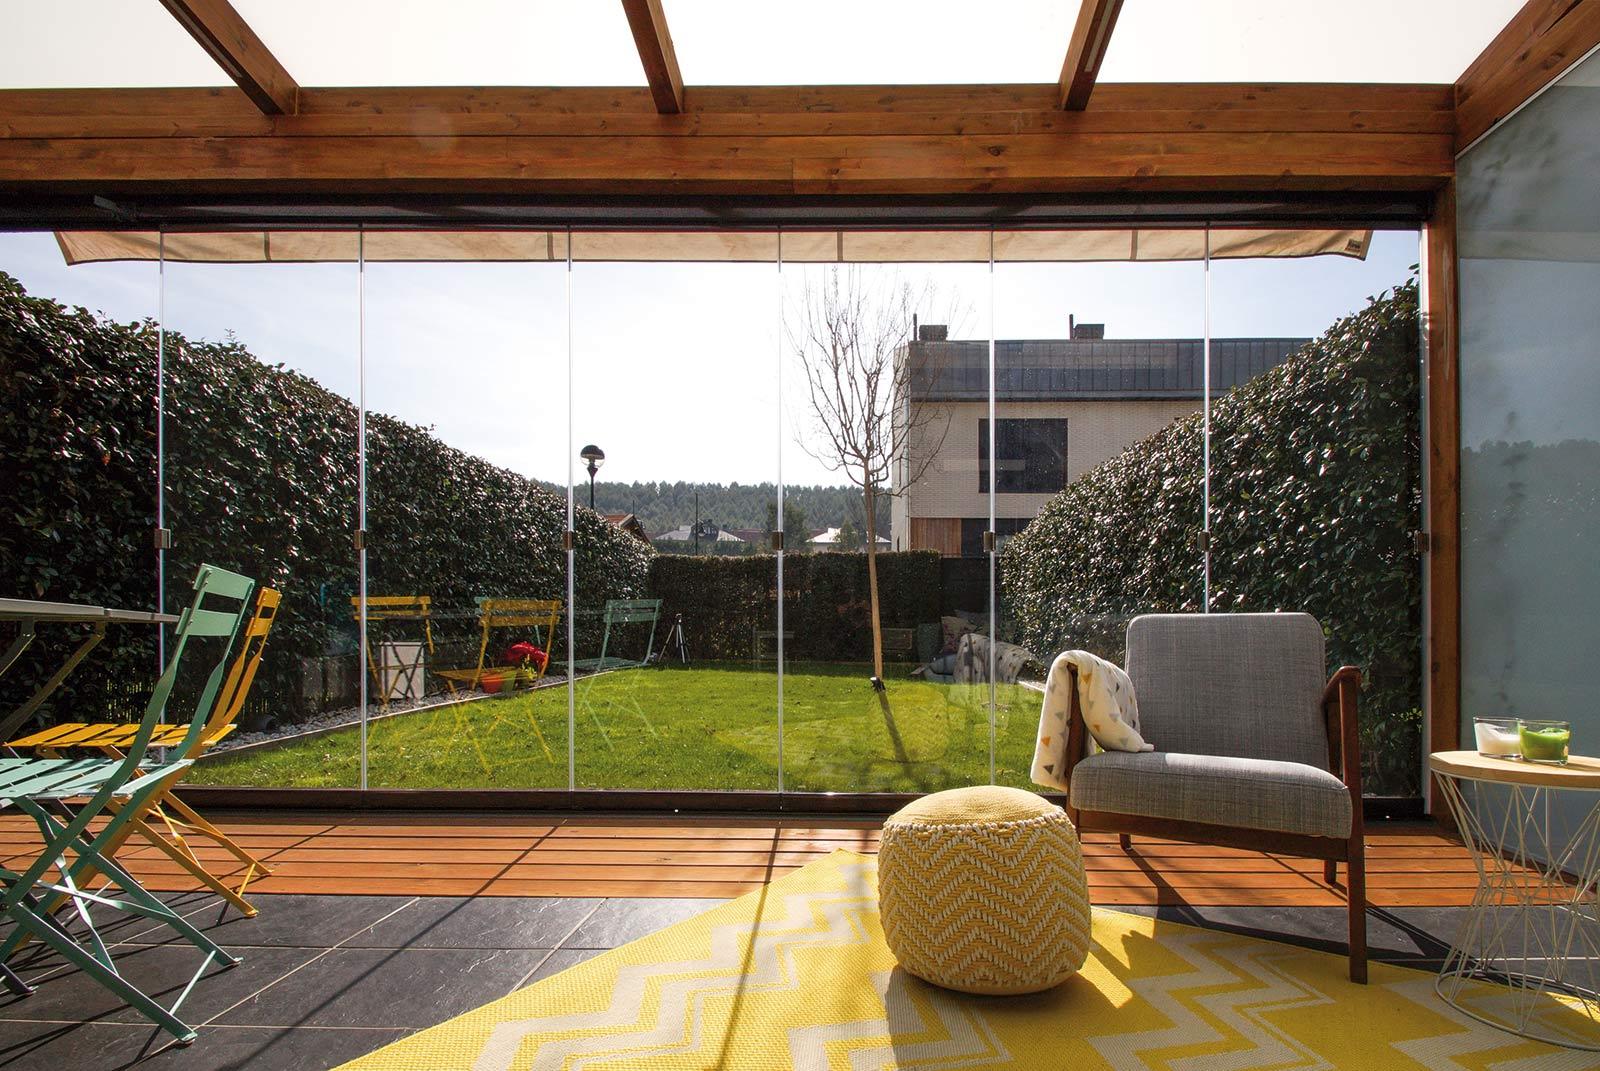 Porche de madera de estilo moderno